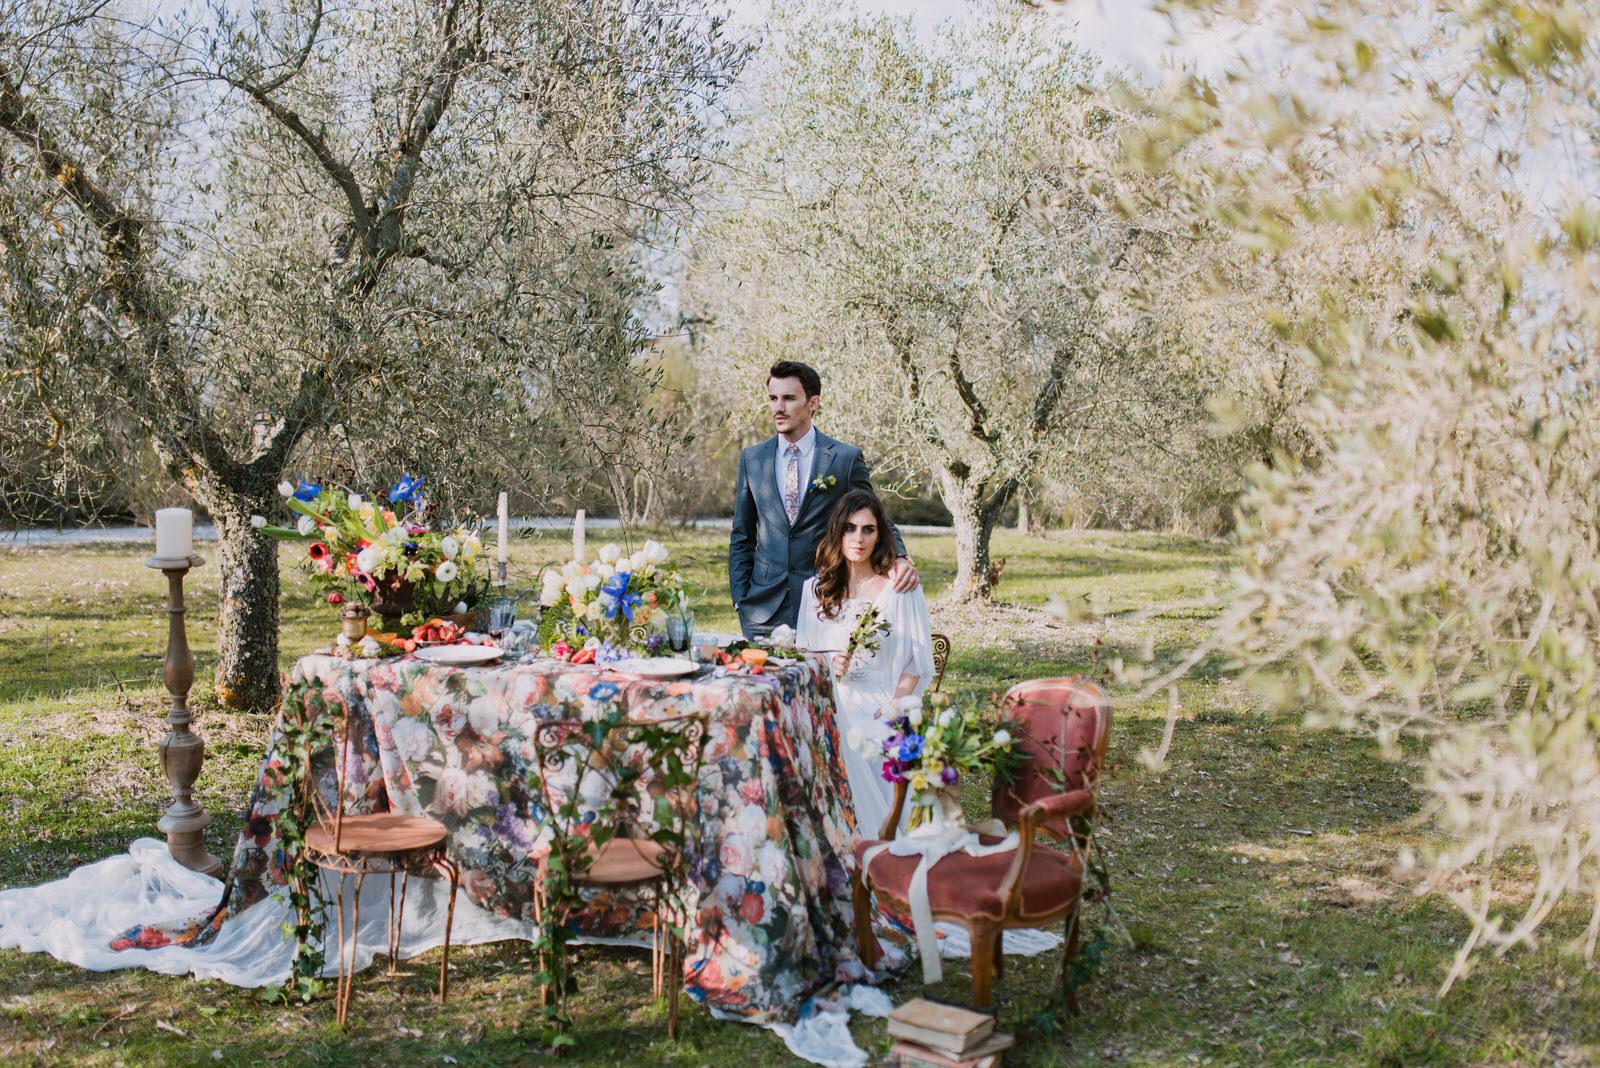 tuscany wedding photography 36.jpg